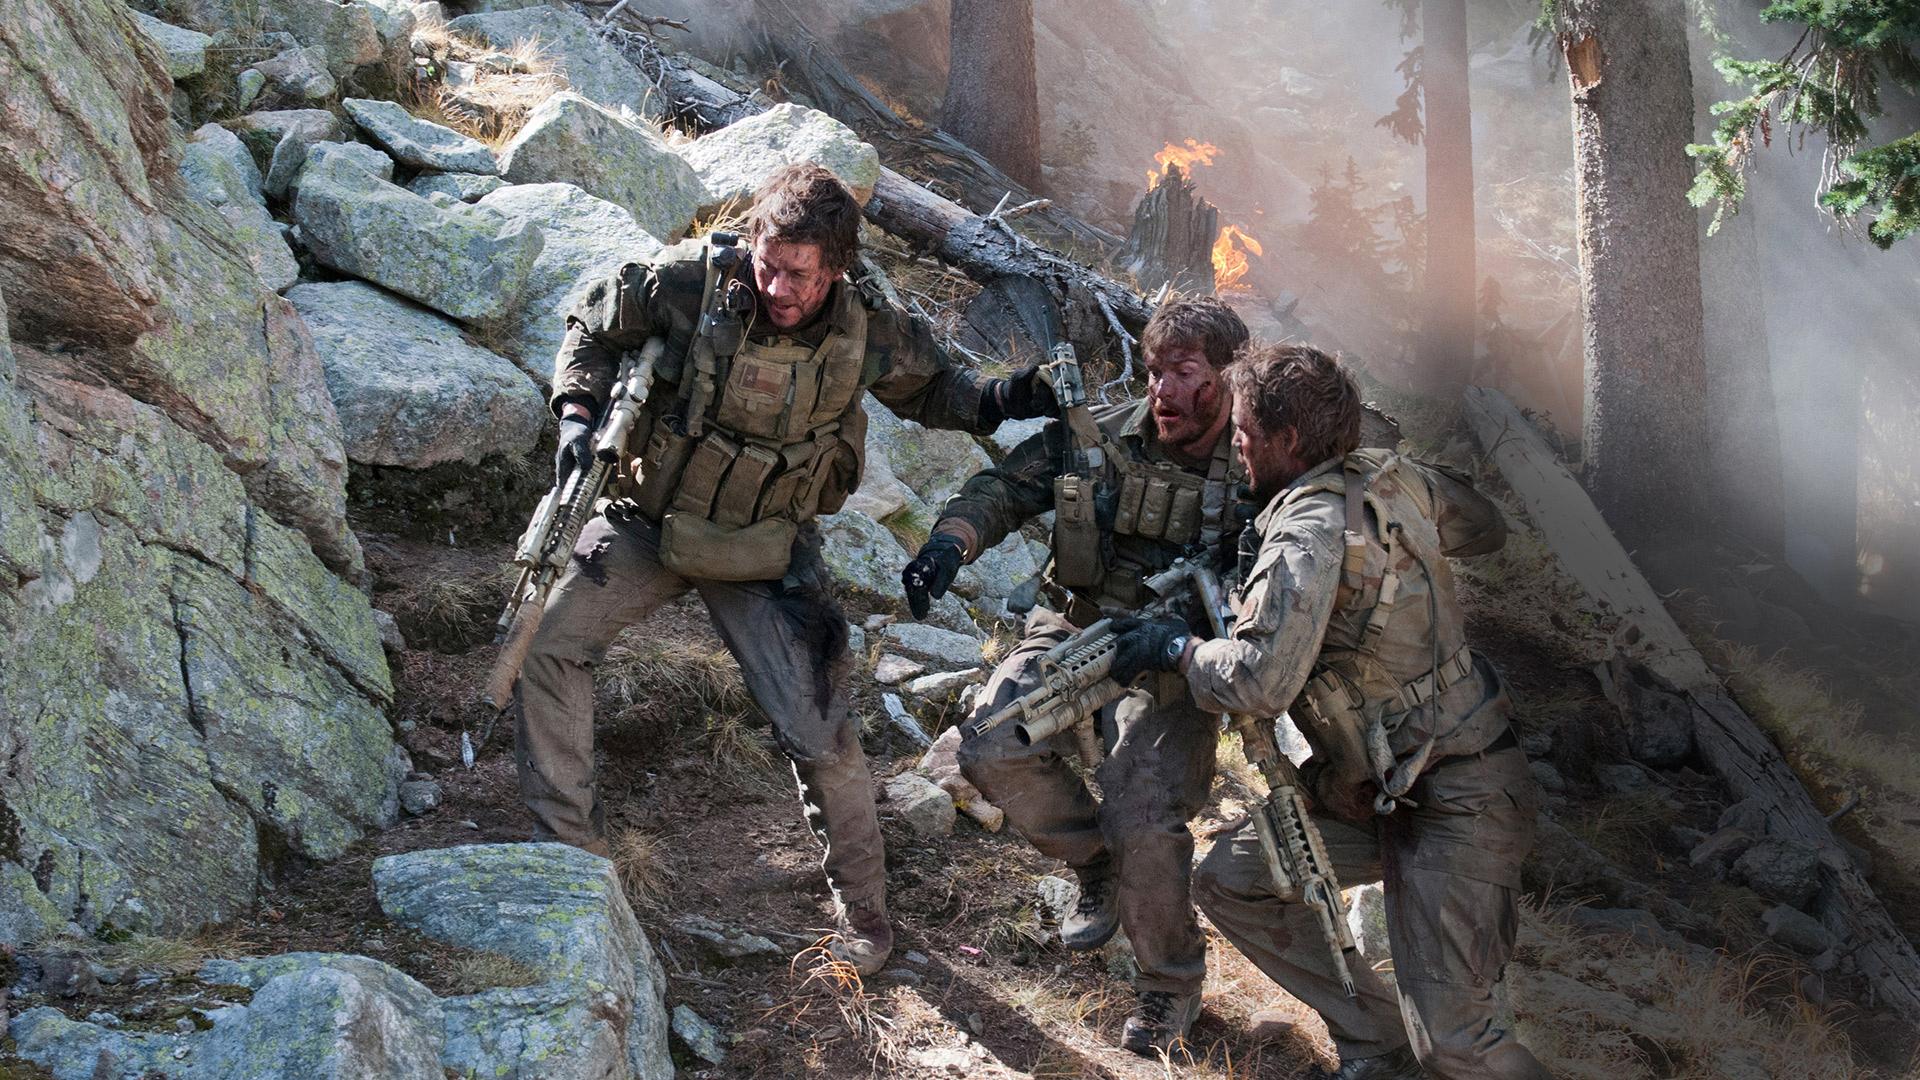 Lone Survivor wallpapers, Movie, HQ Lone Survivor pictures ...